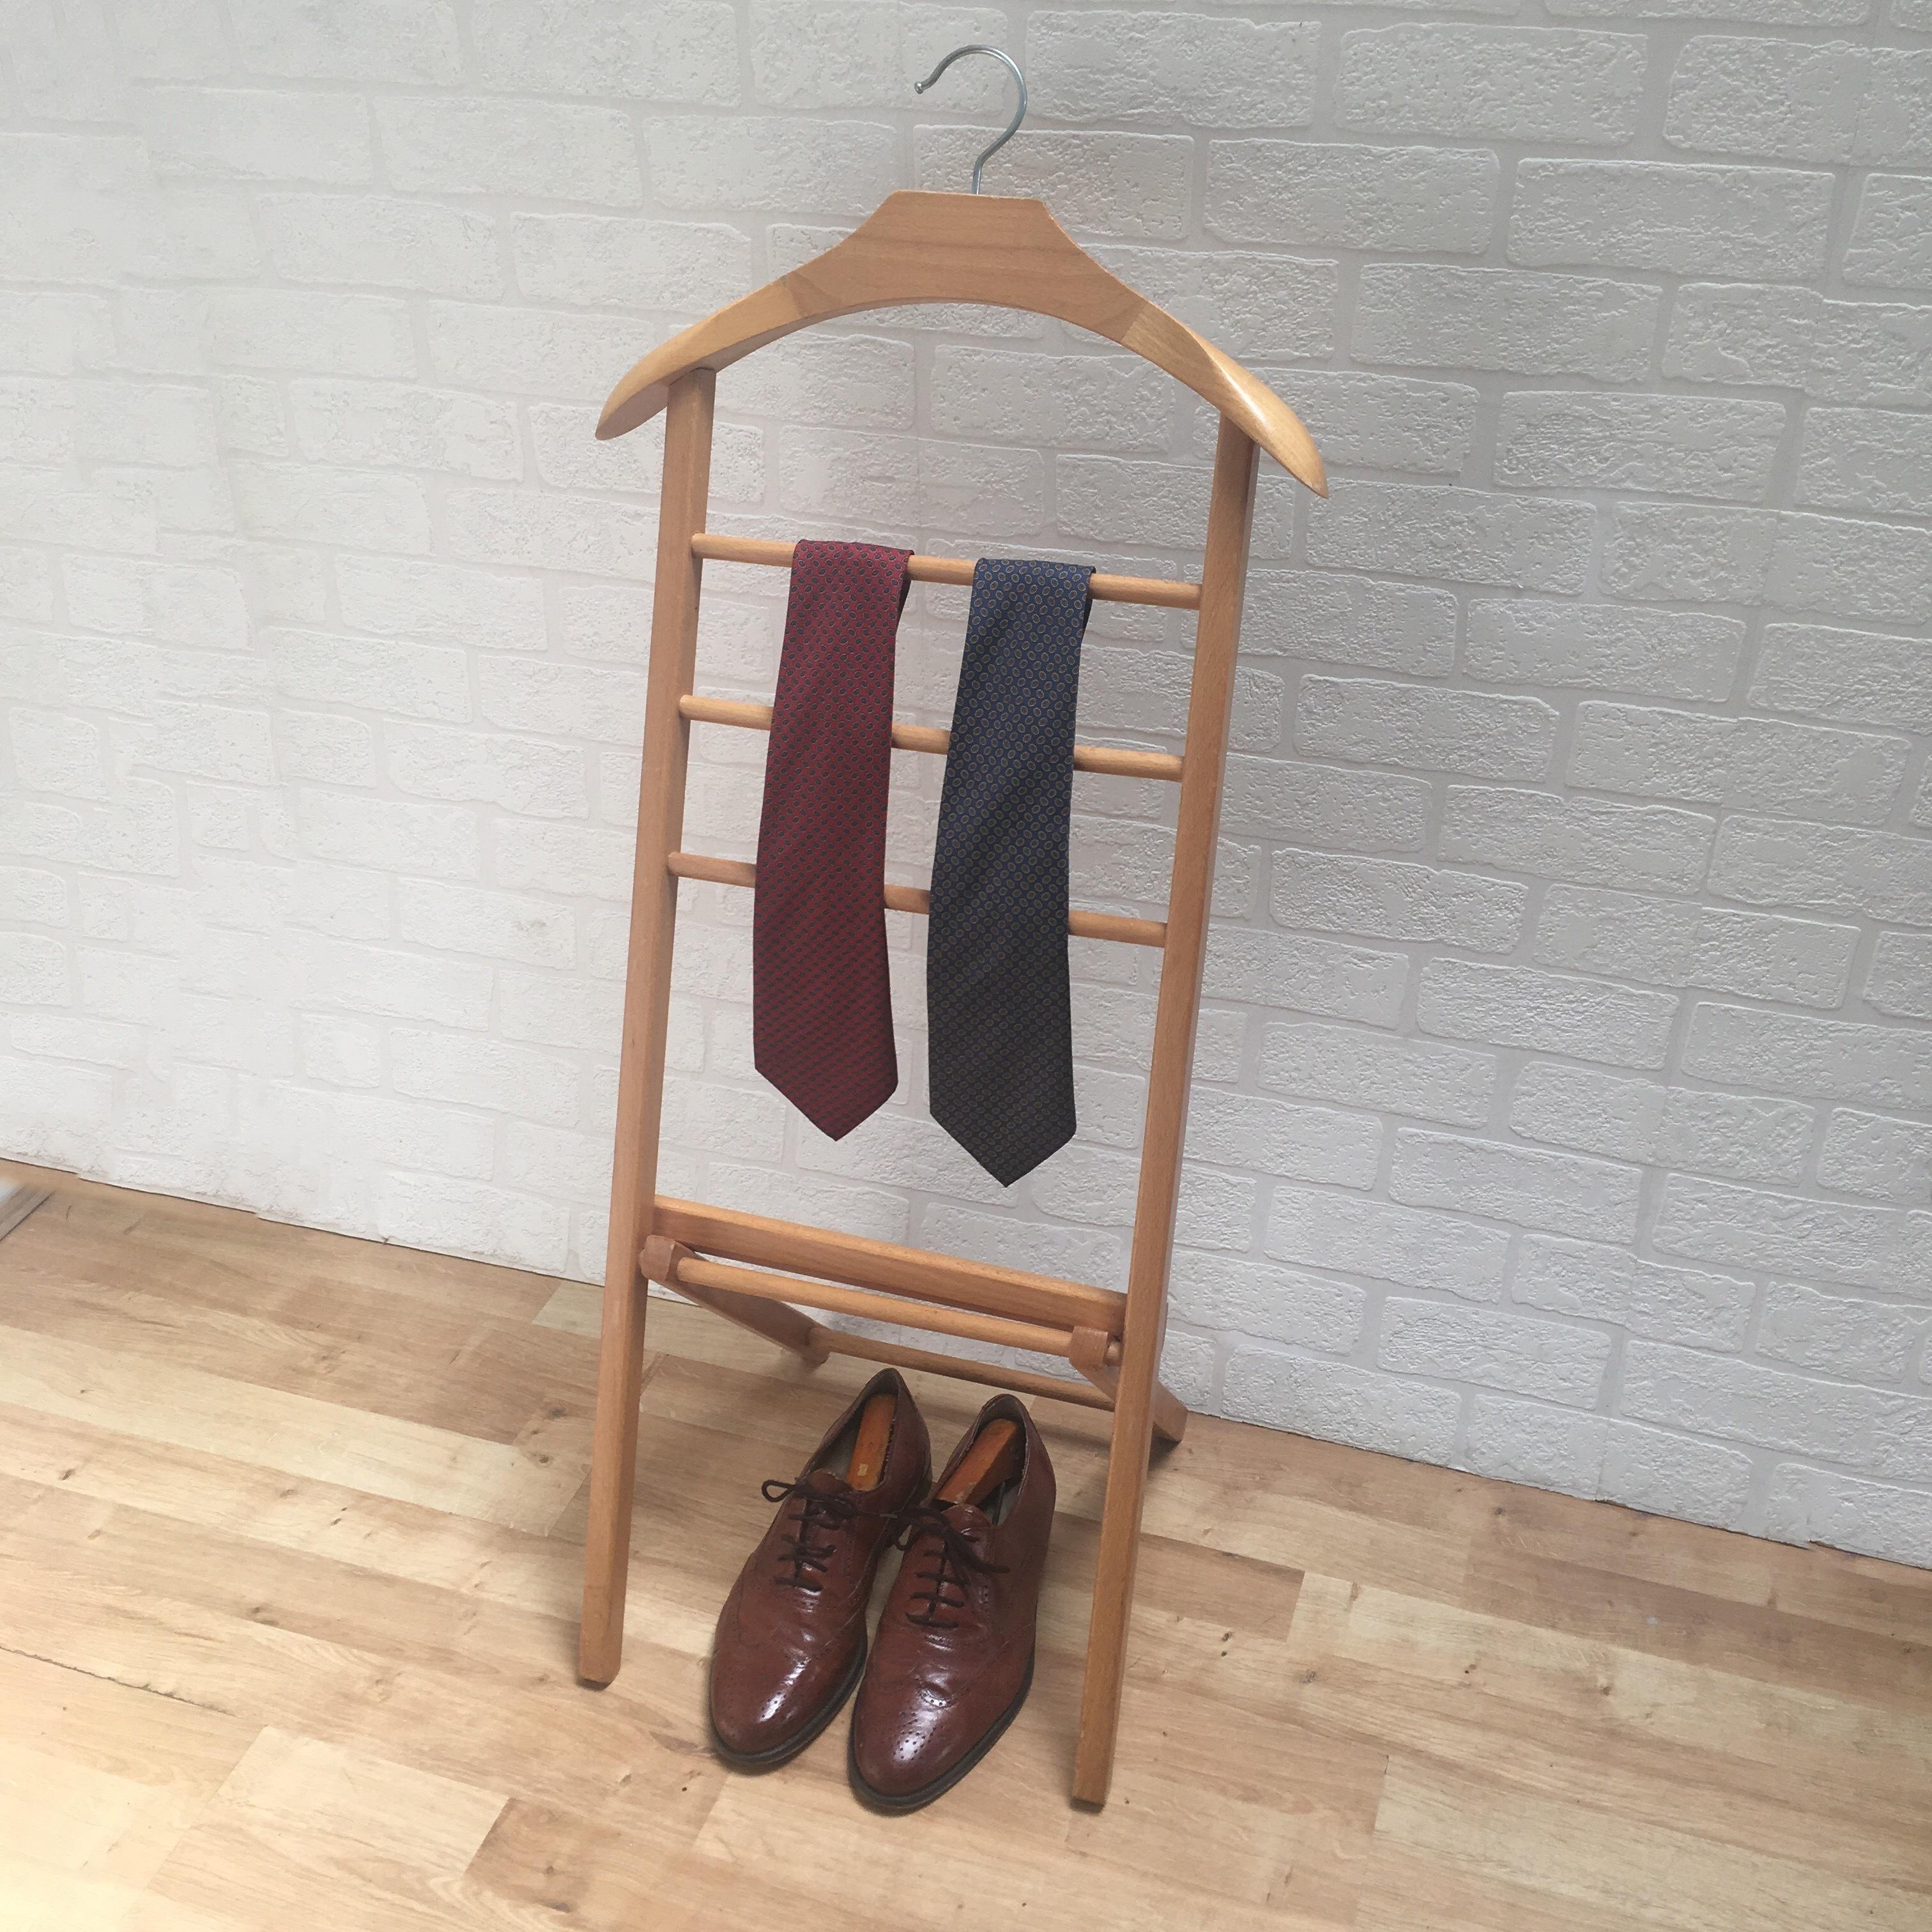 original vintage retro wooden valet stand gentleman butler jacket suit trousers ties shoes storage free standing folding clothes hanger